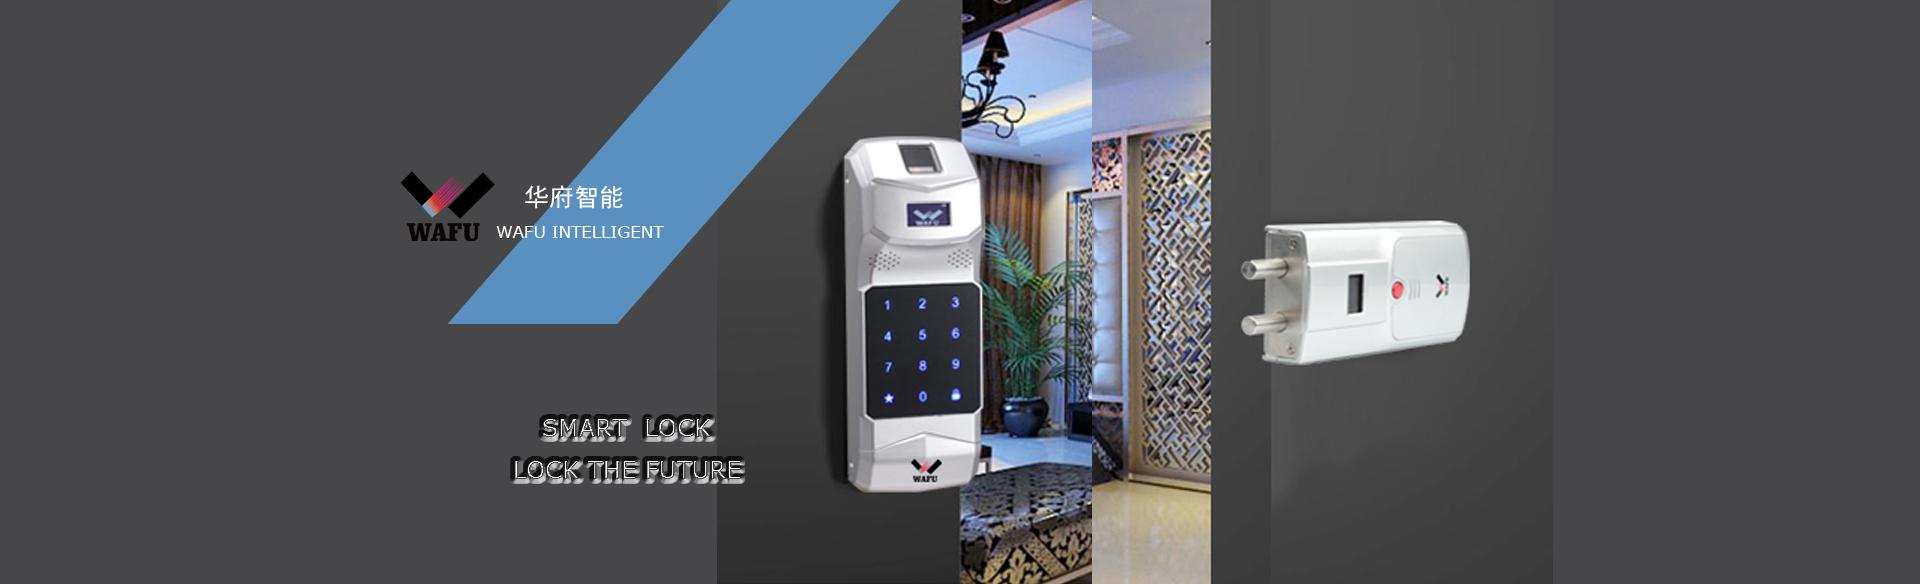 WAFU:fingerprint lock,password lock,code lock,smart lock,intelligent lock,electronic lock,remote loc